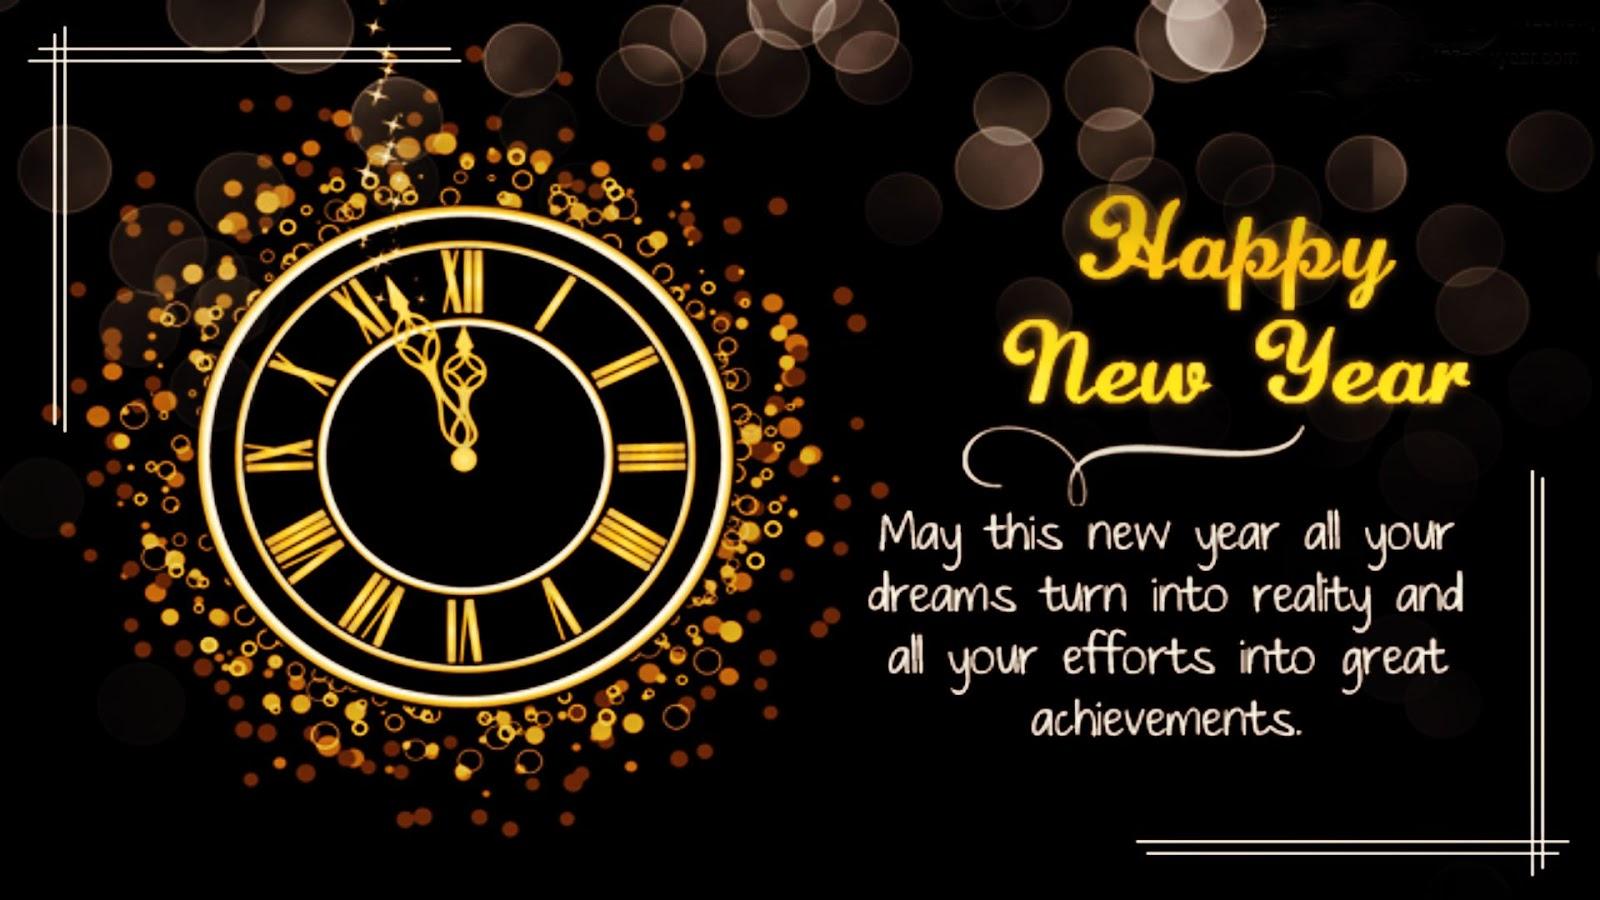 Gambar Kembang Api Tahun Baru Happy New Year 2018